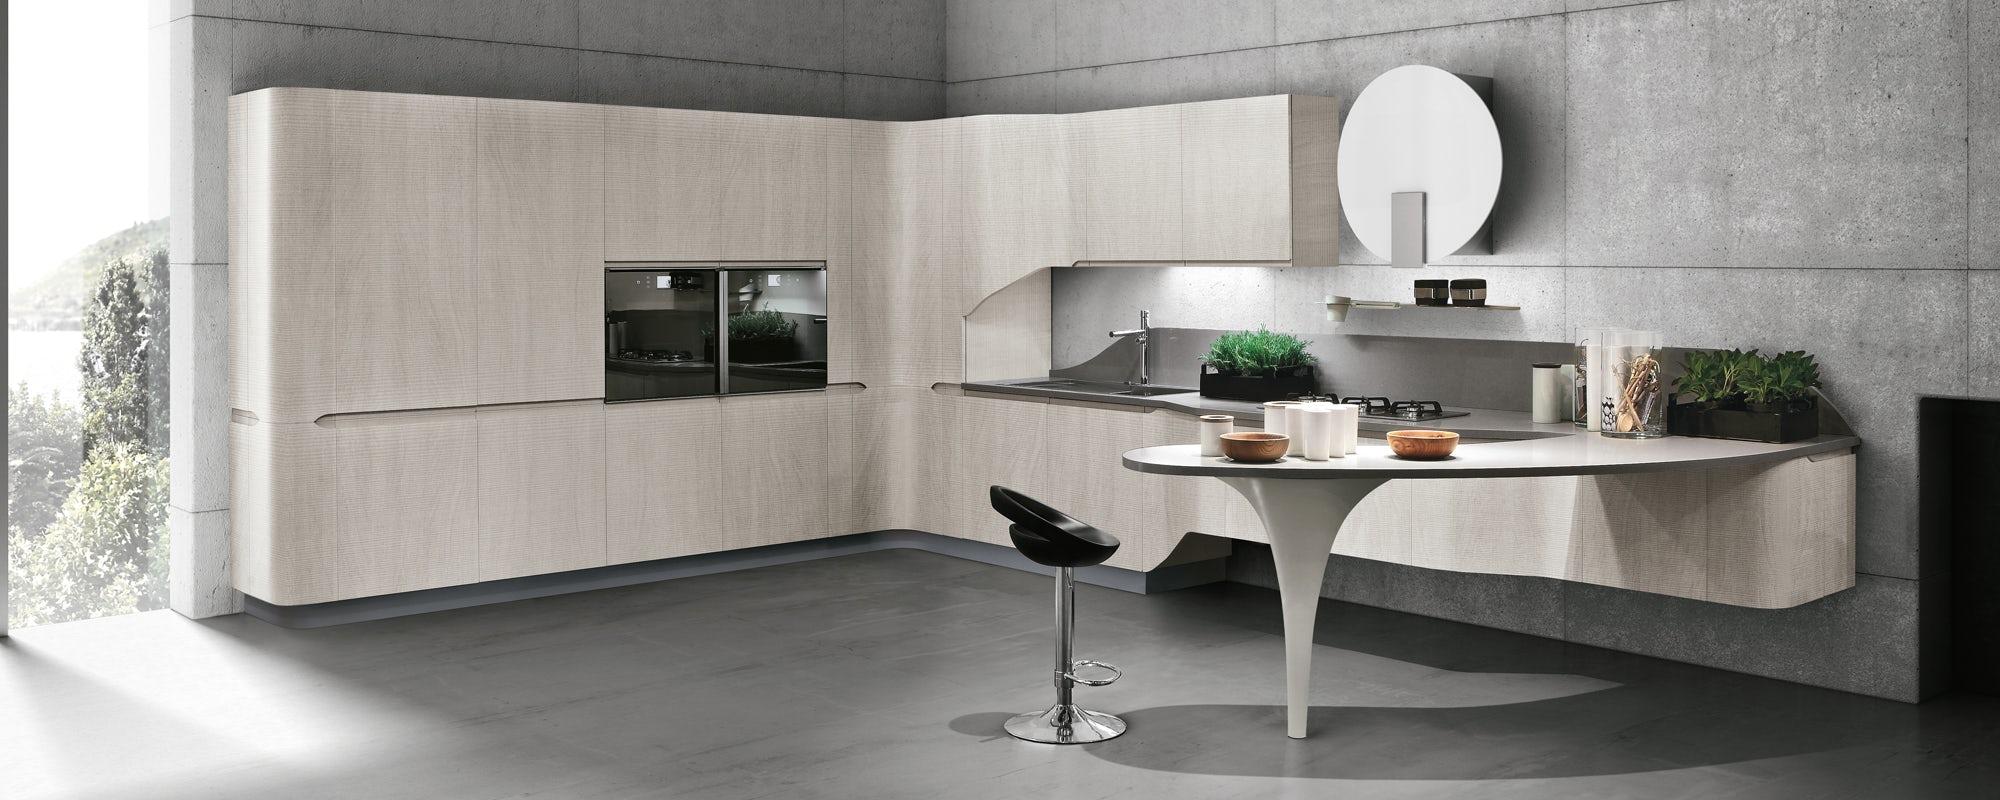 Cucina Stosa Bring Lecce